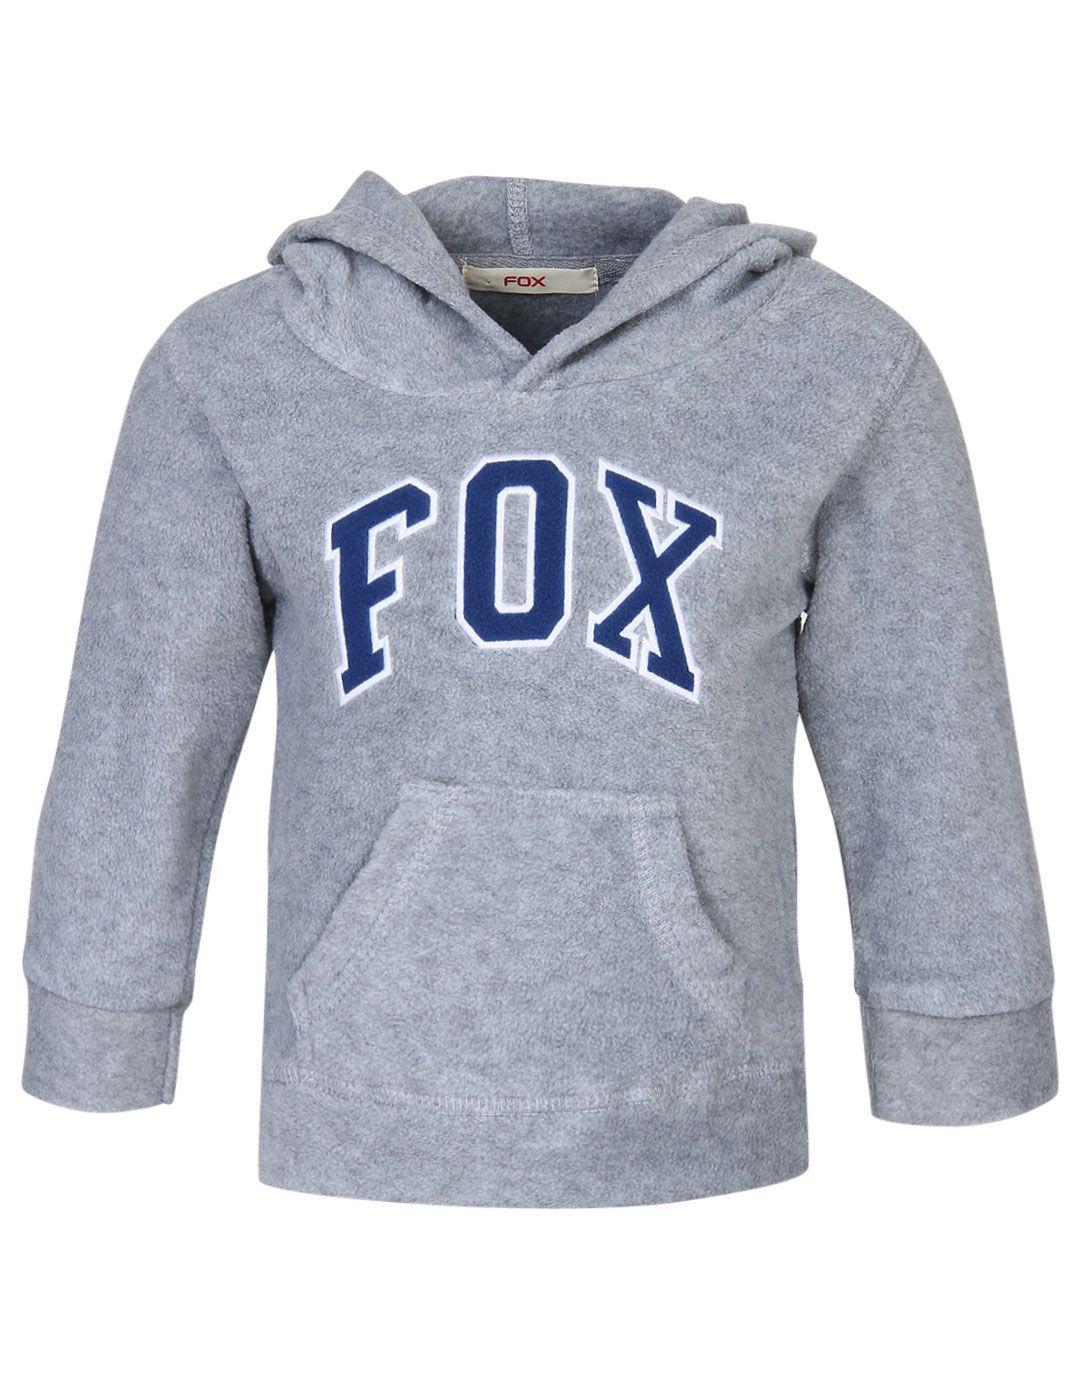 Fox Grey Sweatshirt for Girls